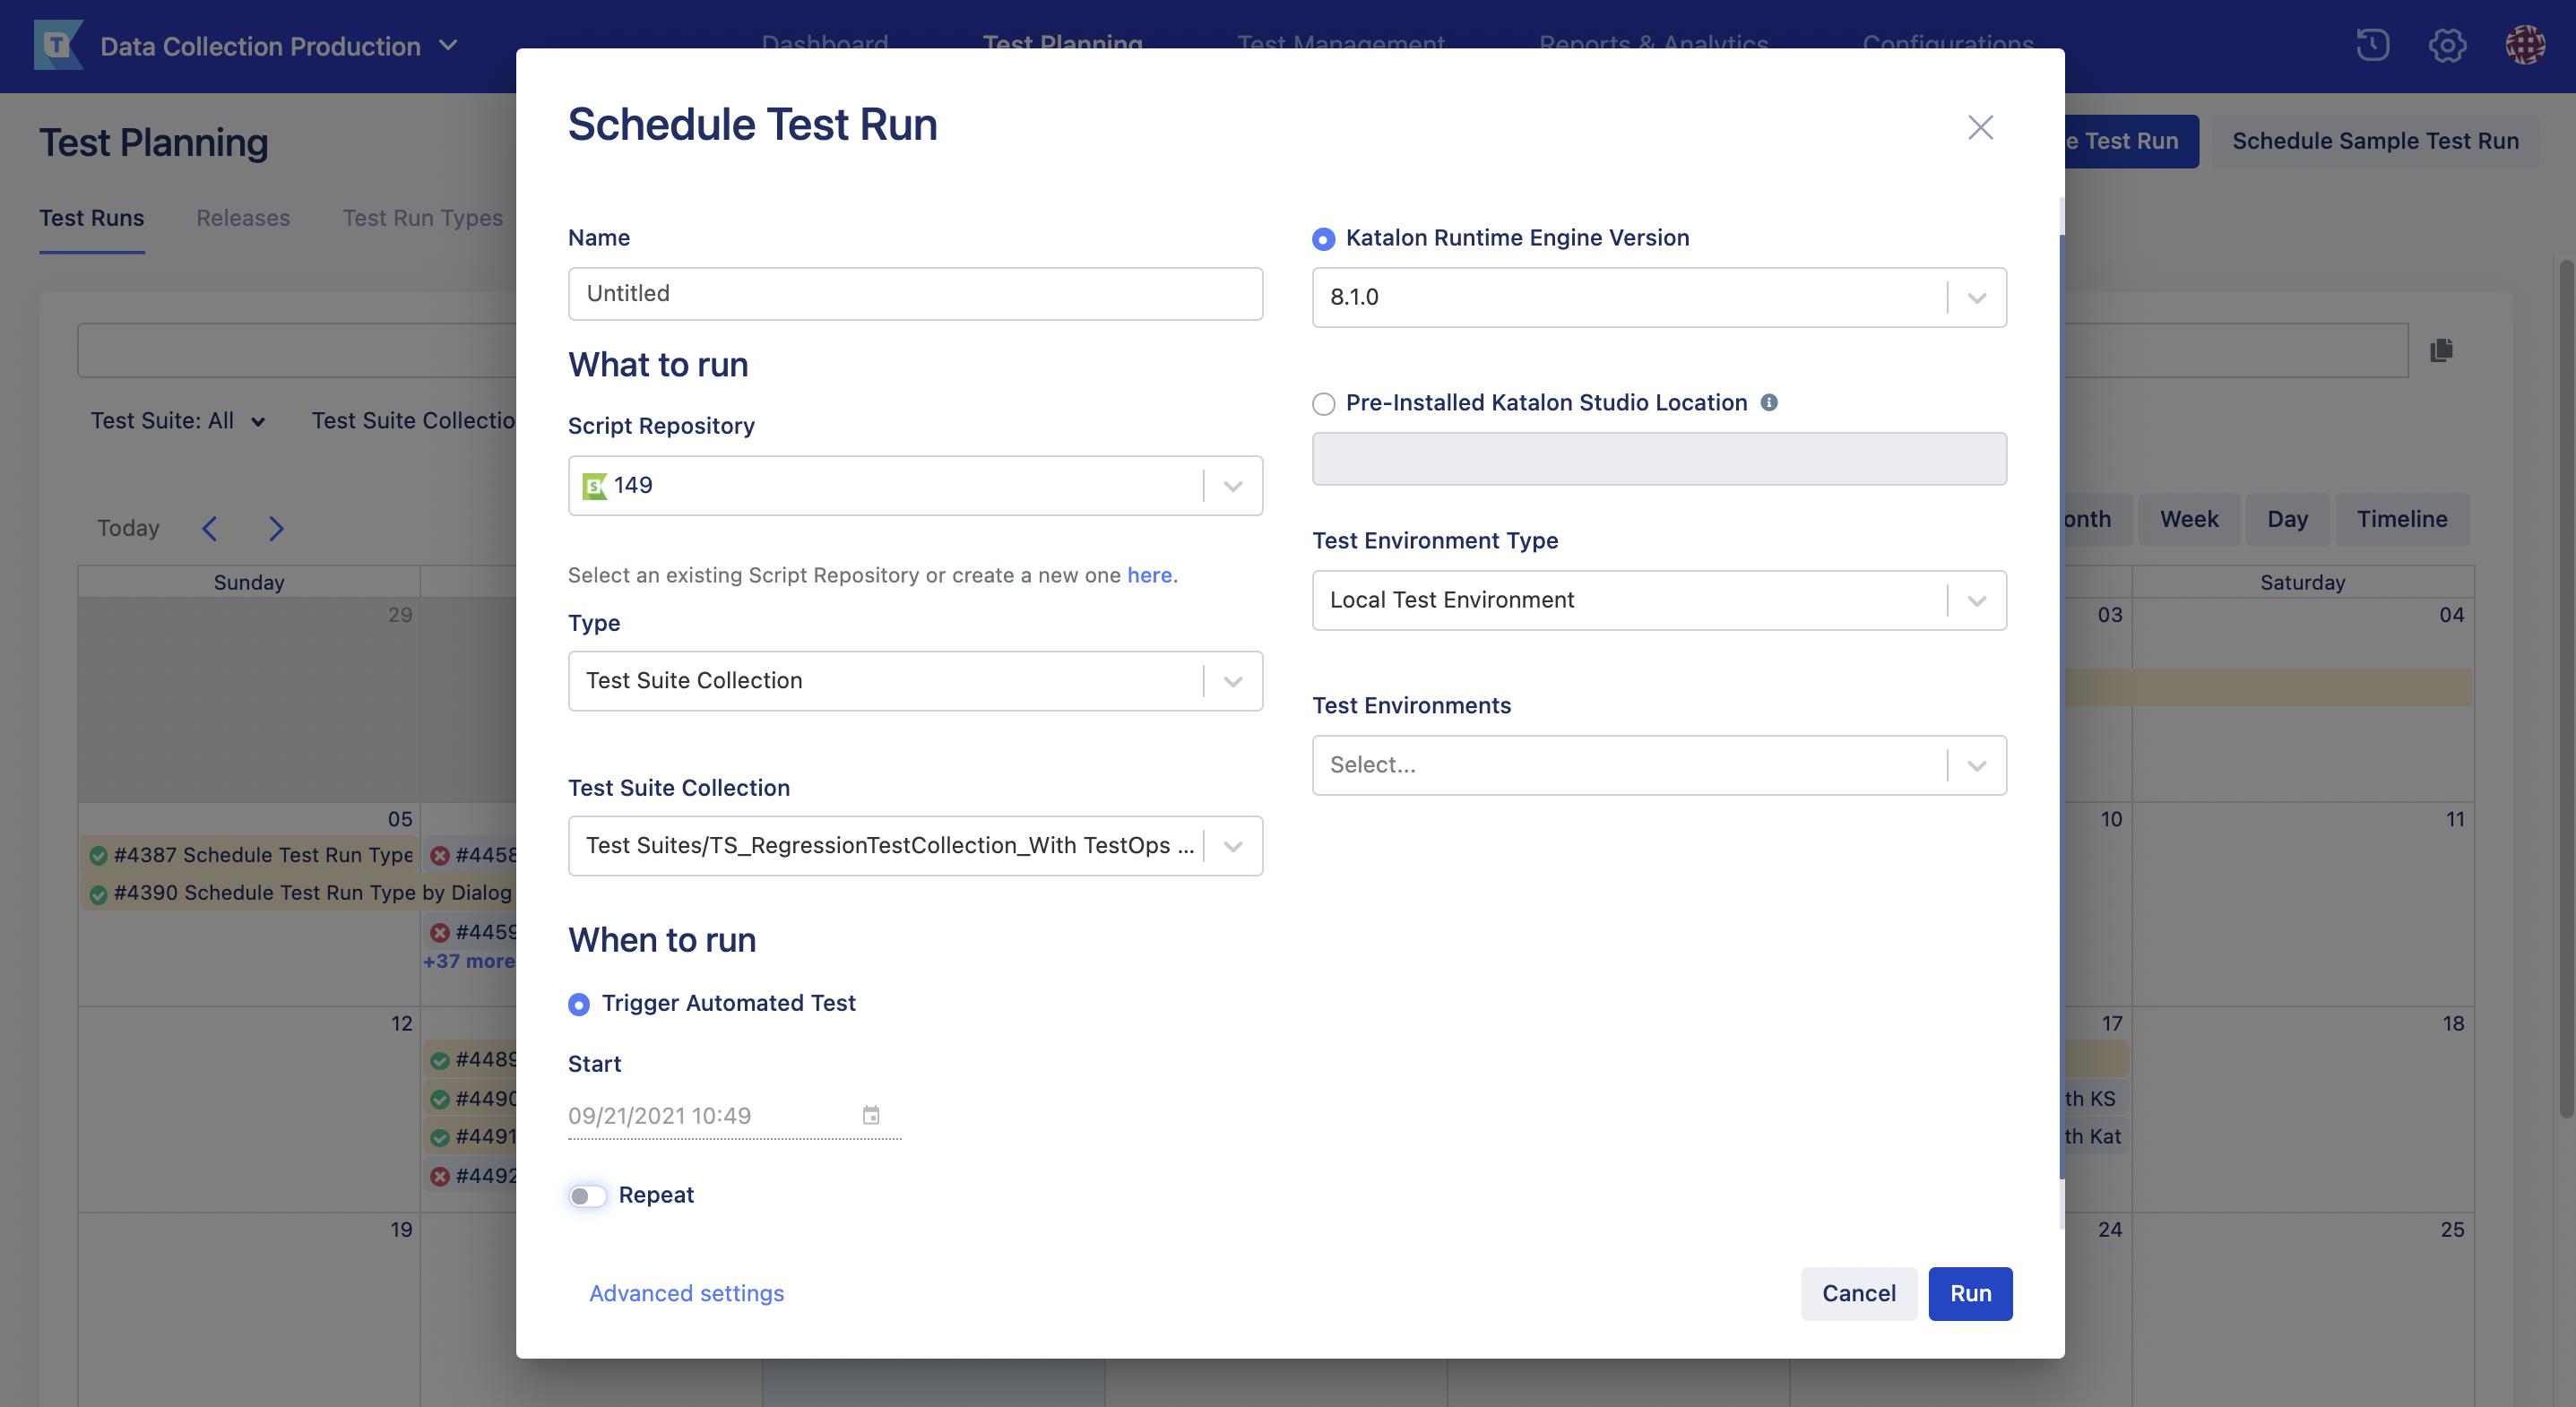 schedule test run page new UI manual run